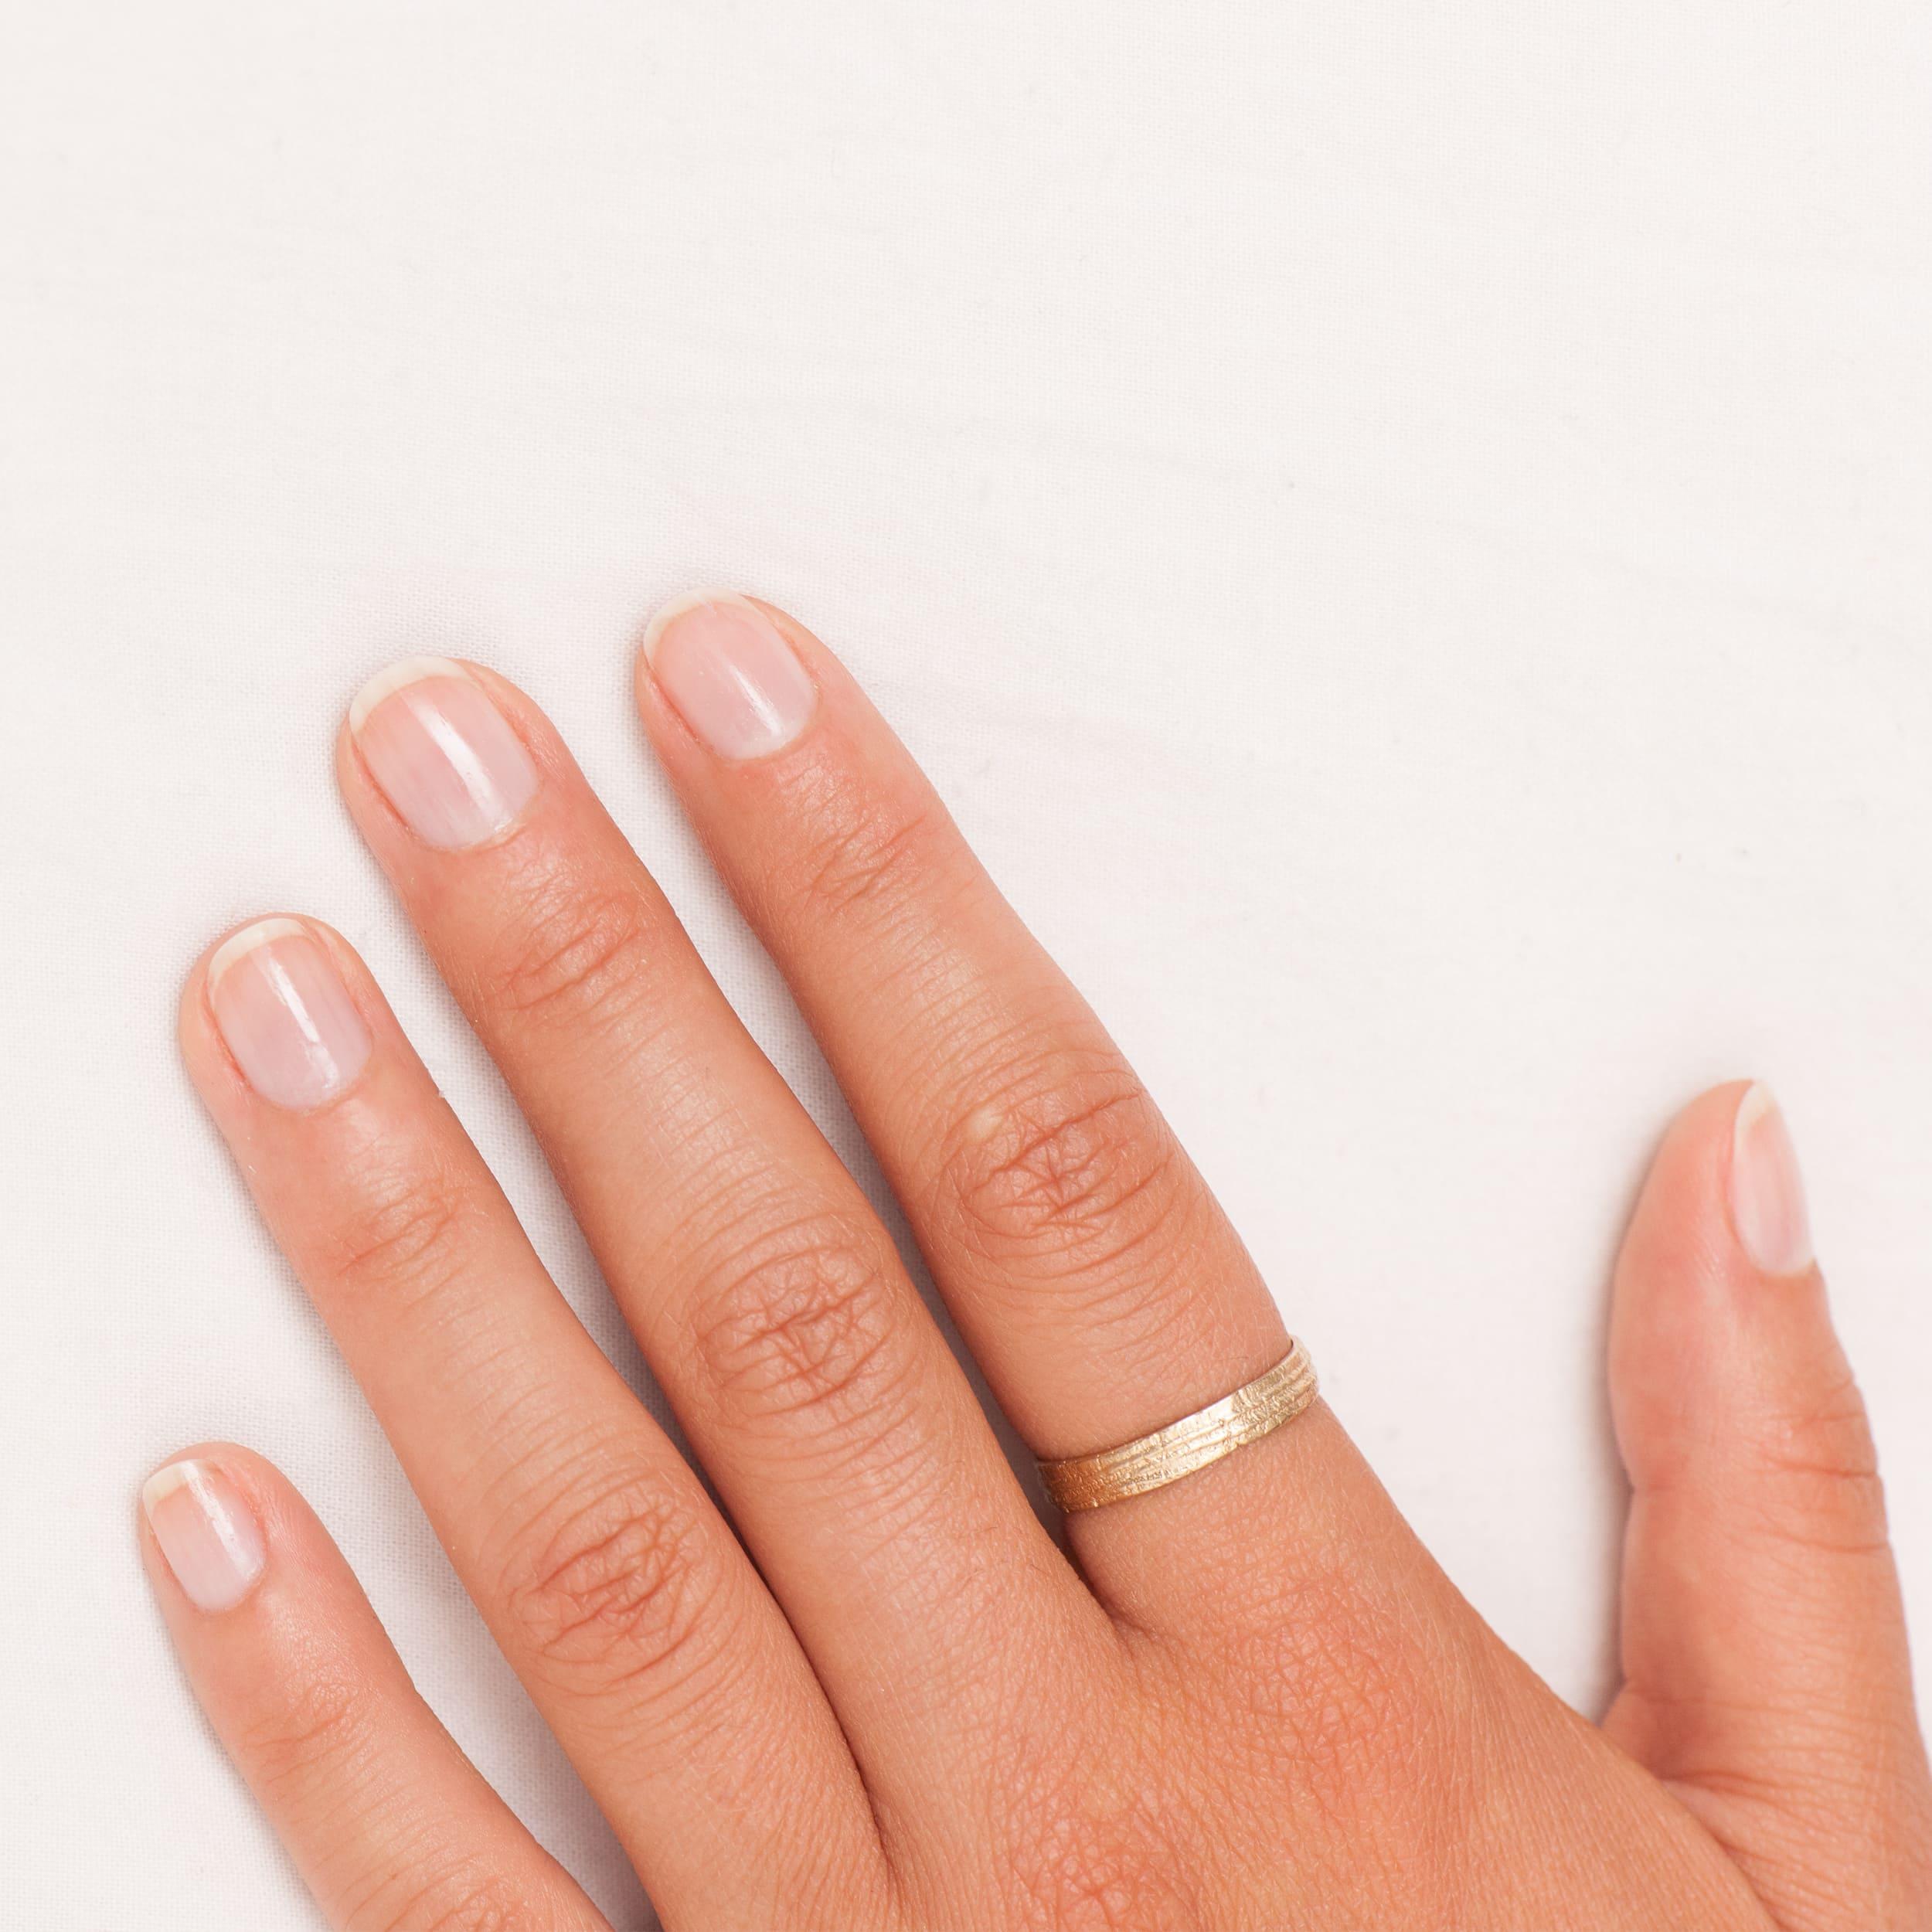 Le rouge à ongles - vernis - 20